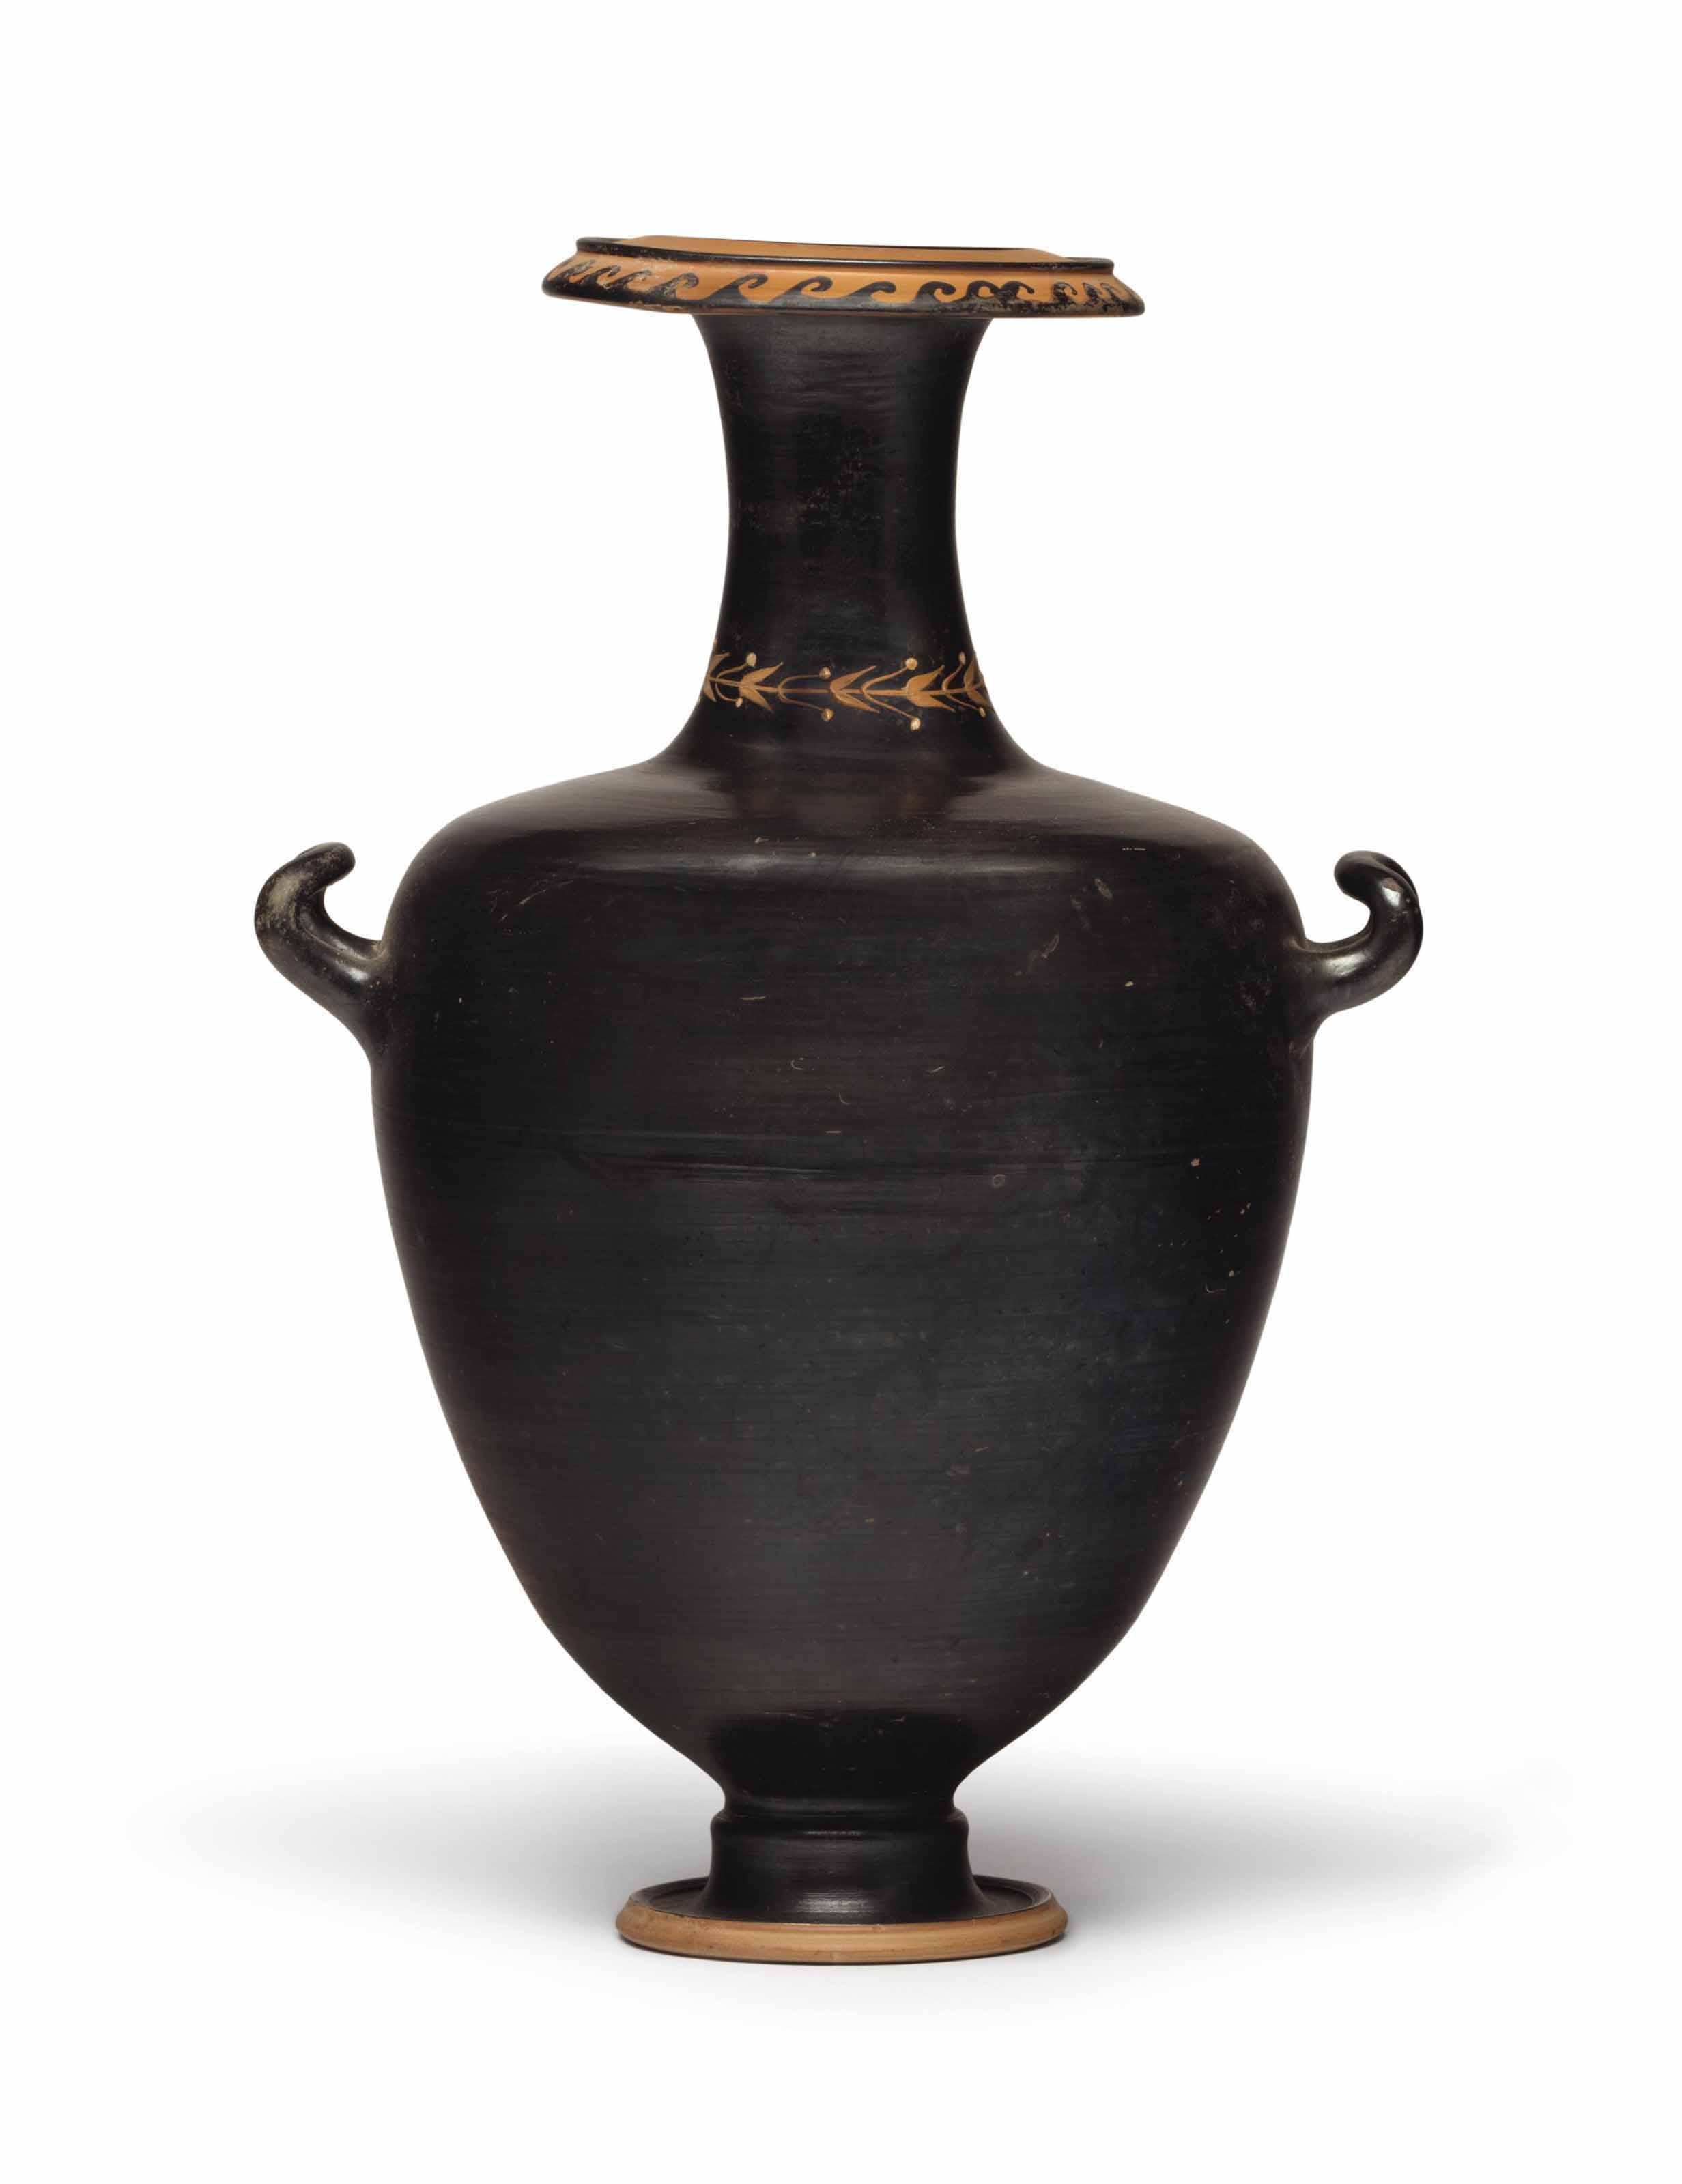 A GREEK BLACK-GLAZED HYDRIA